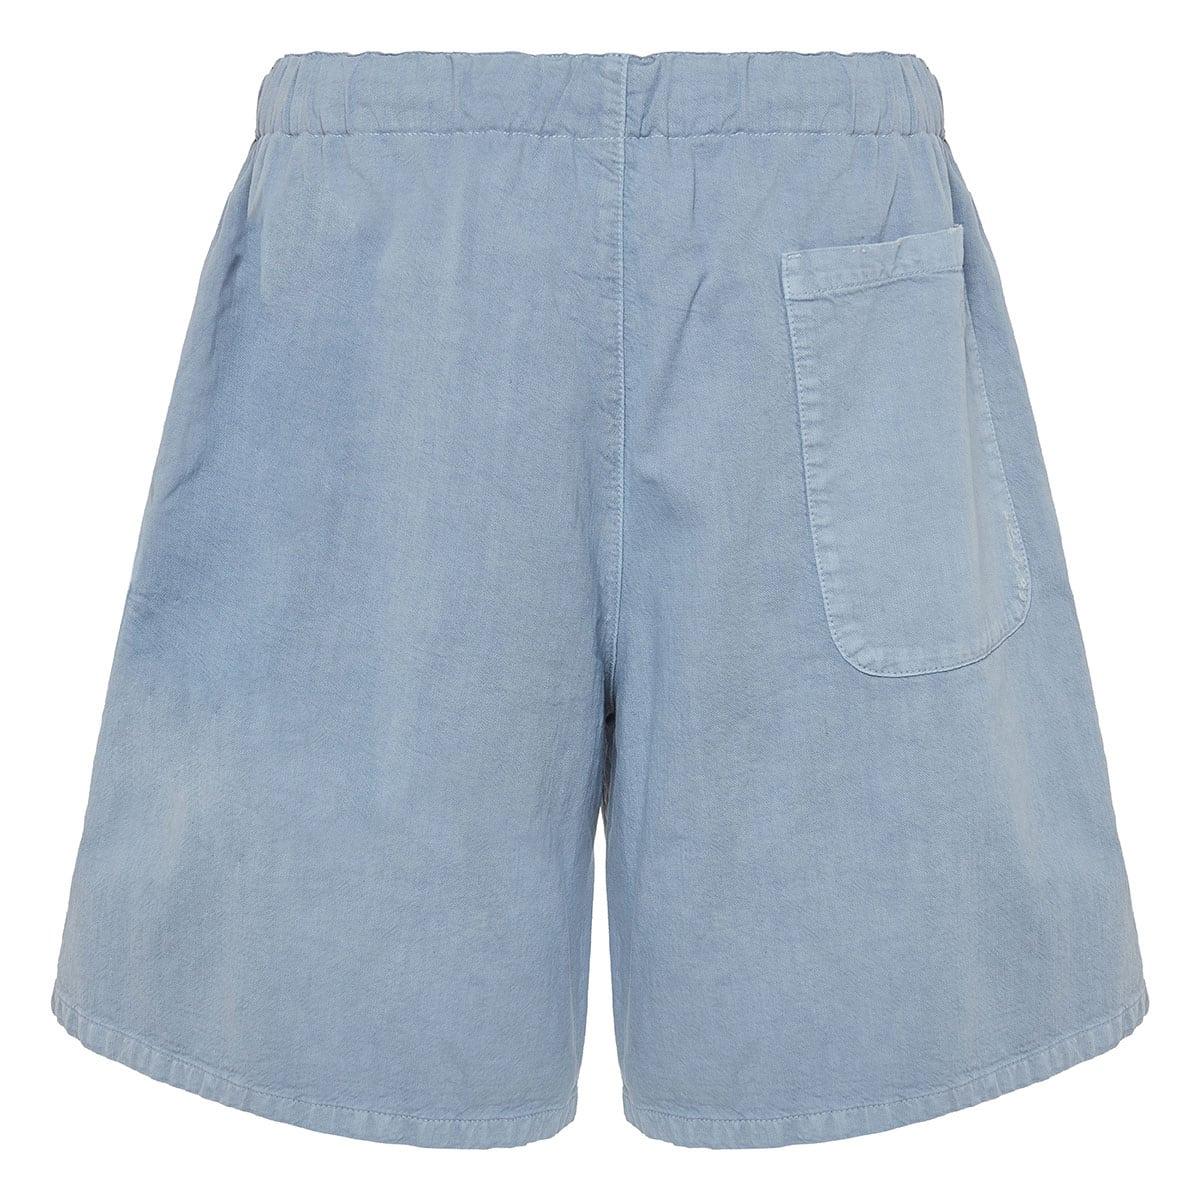 Two-tone cotton shorts